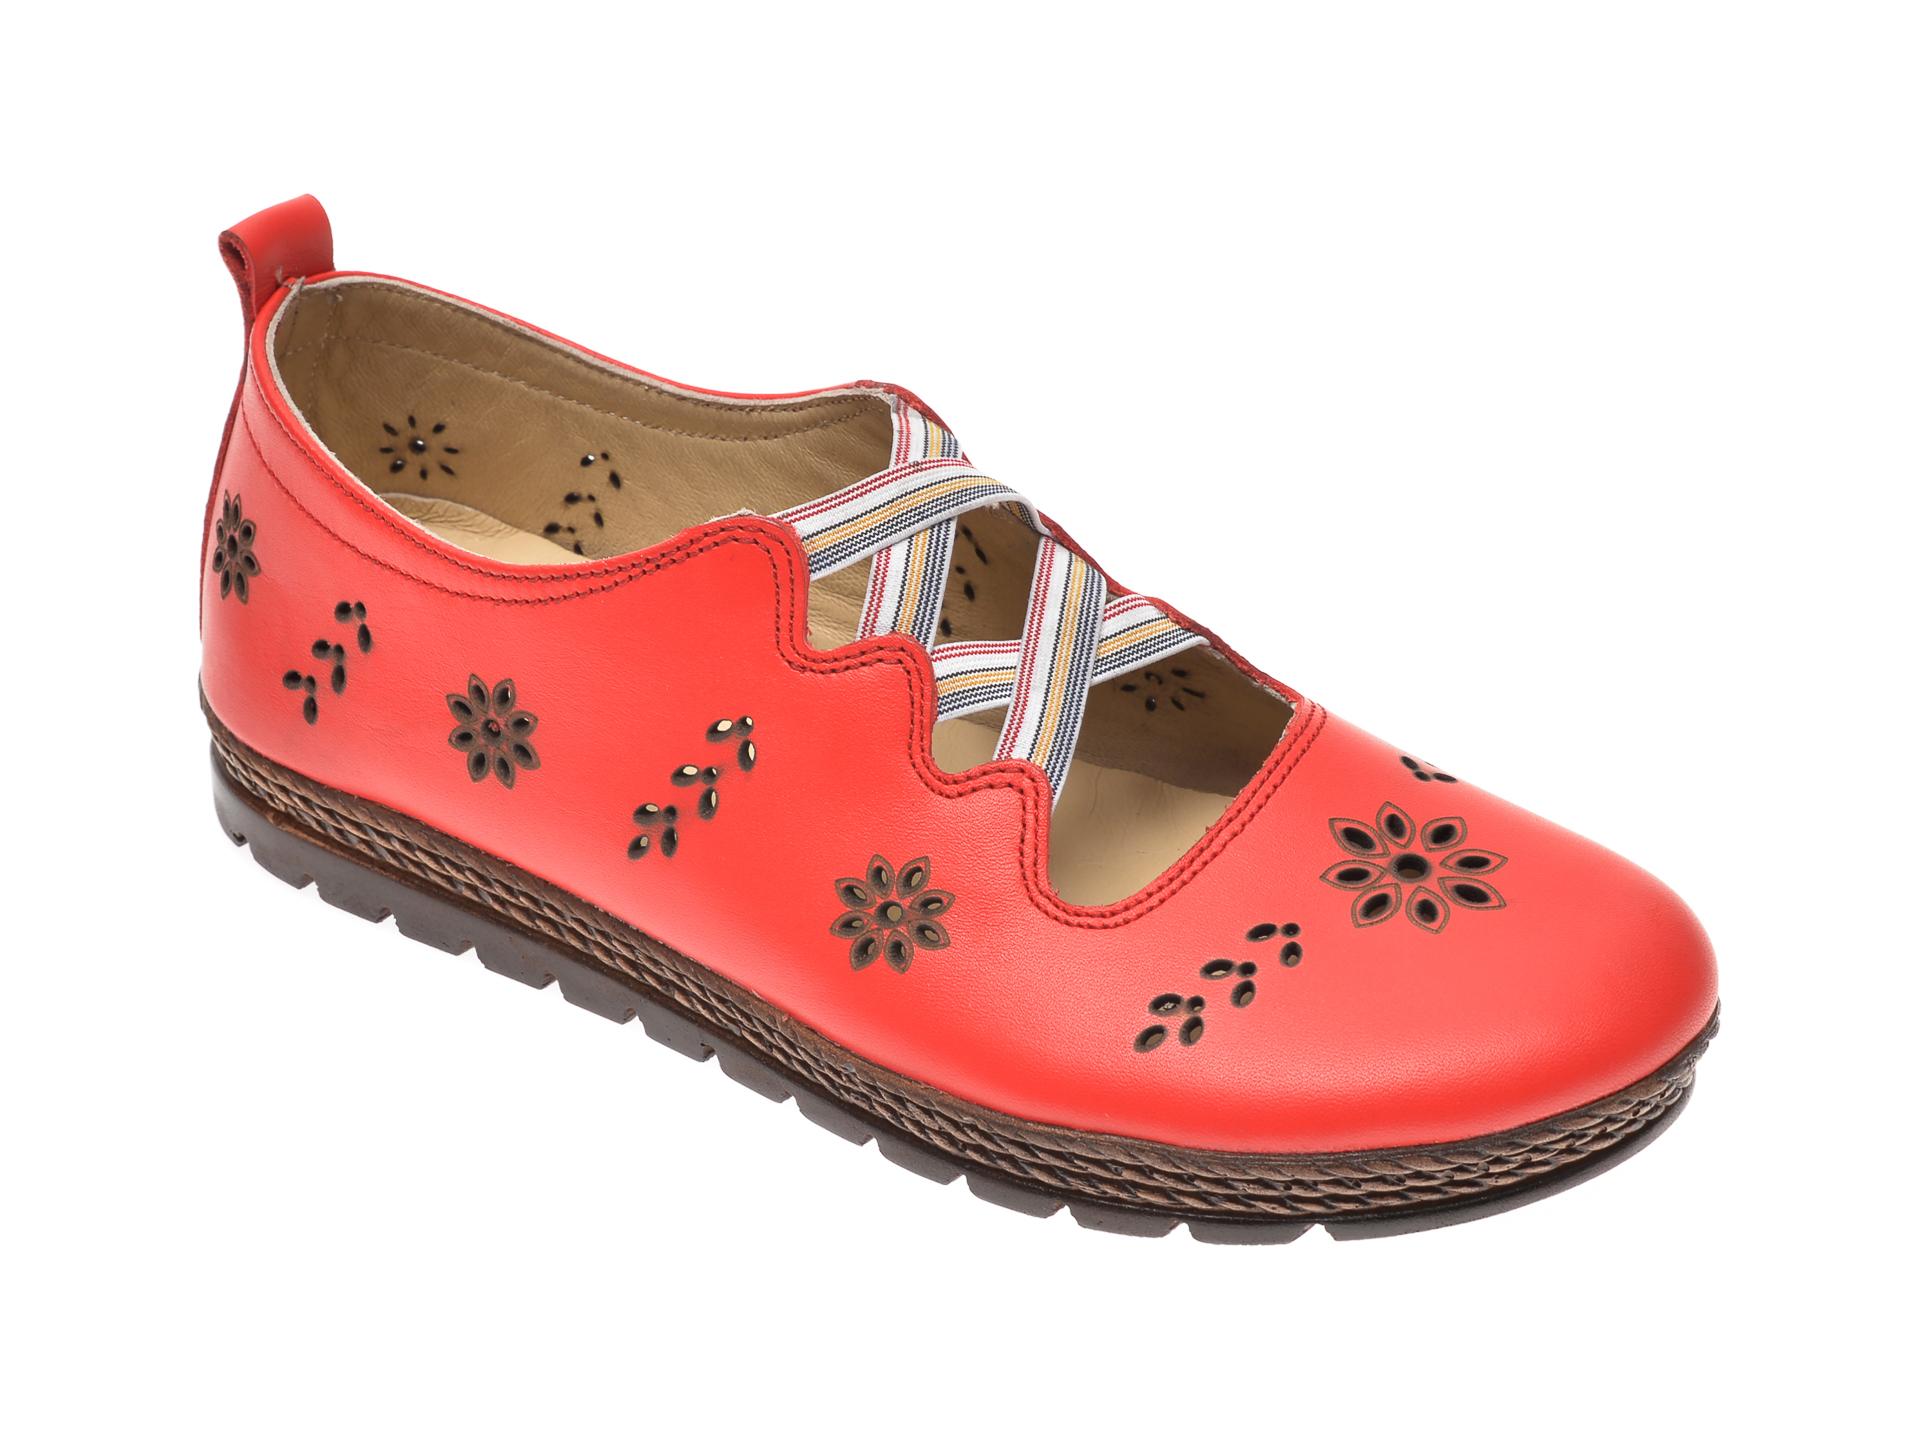 Pantofi PASS COLLECTION rosii, K921041, din piele naturala imagine